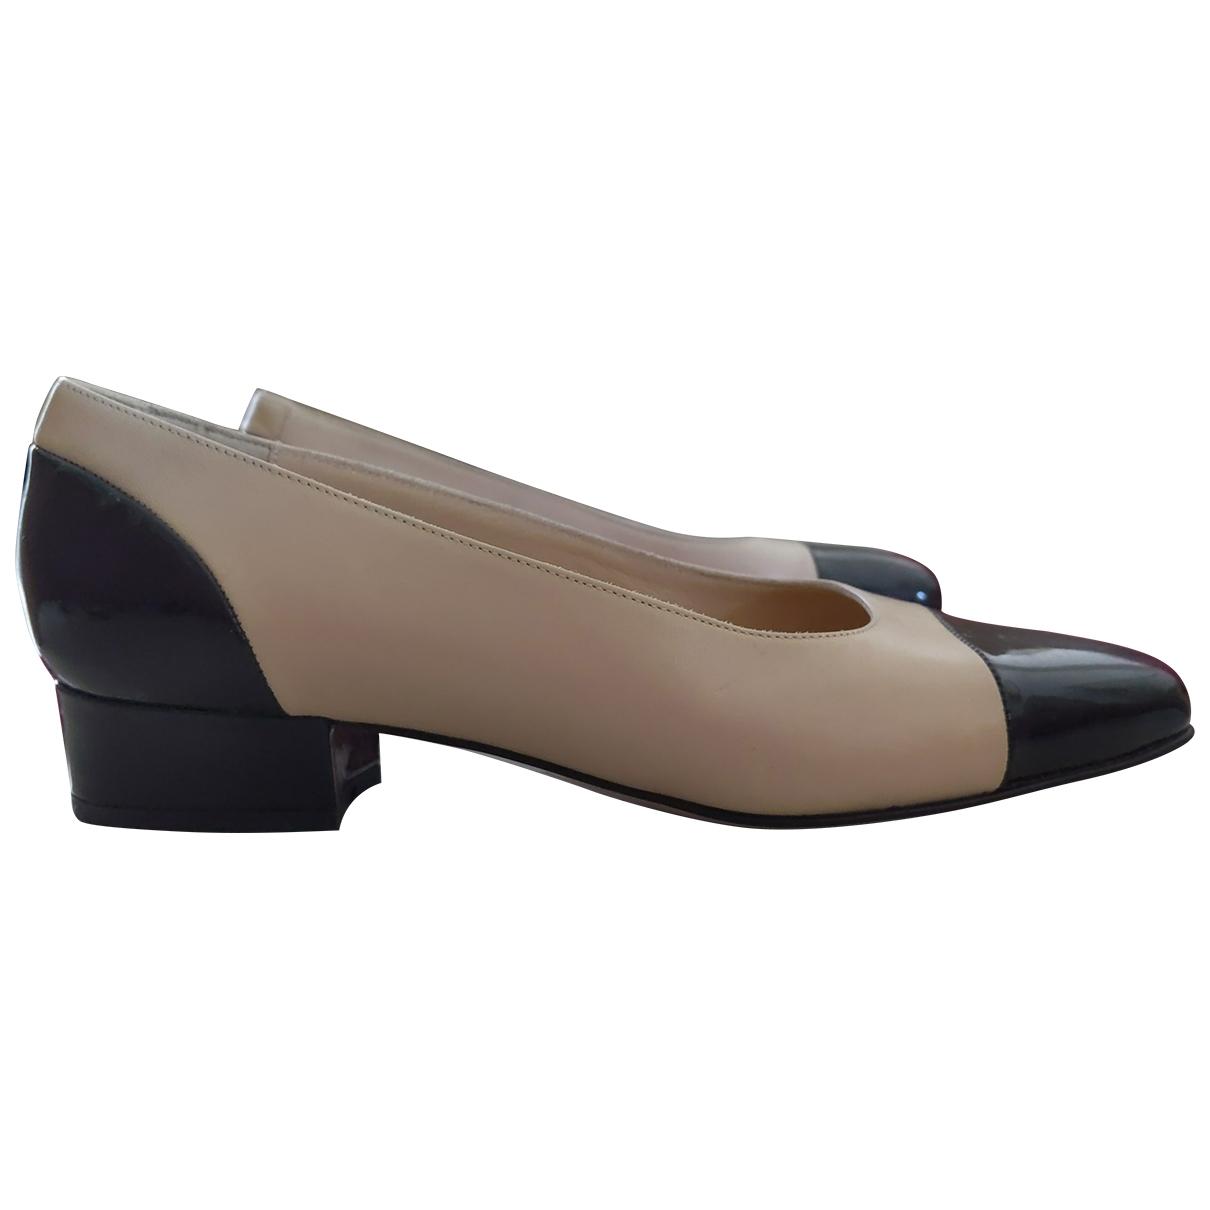 Bruno Magli \N Beige Leather Heels for Women 35.5 EU